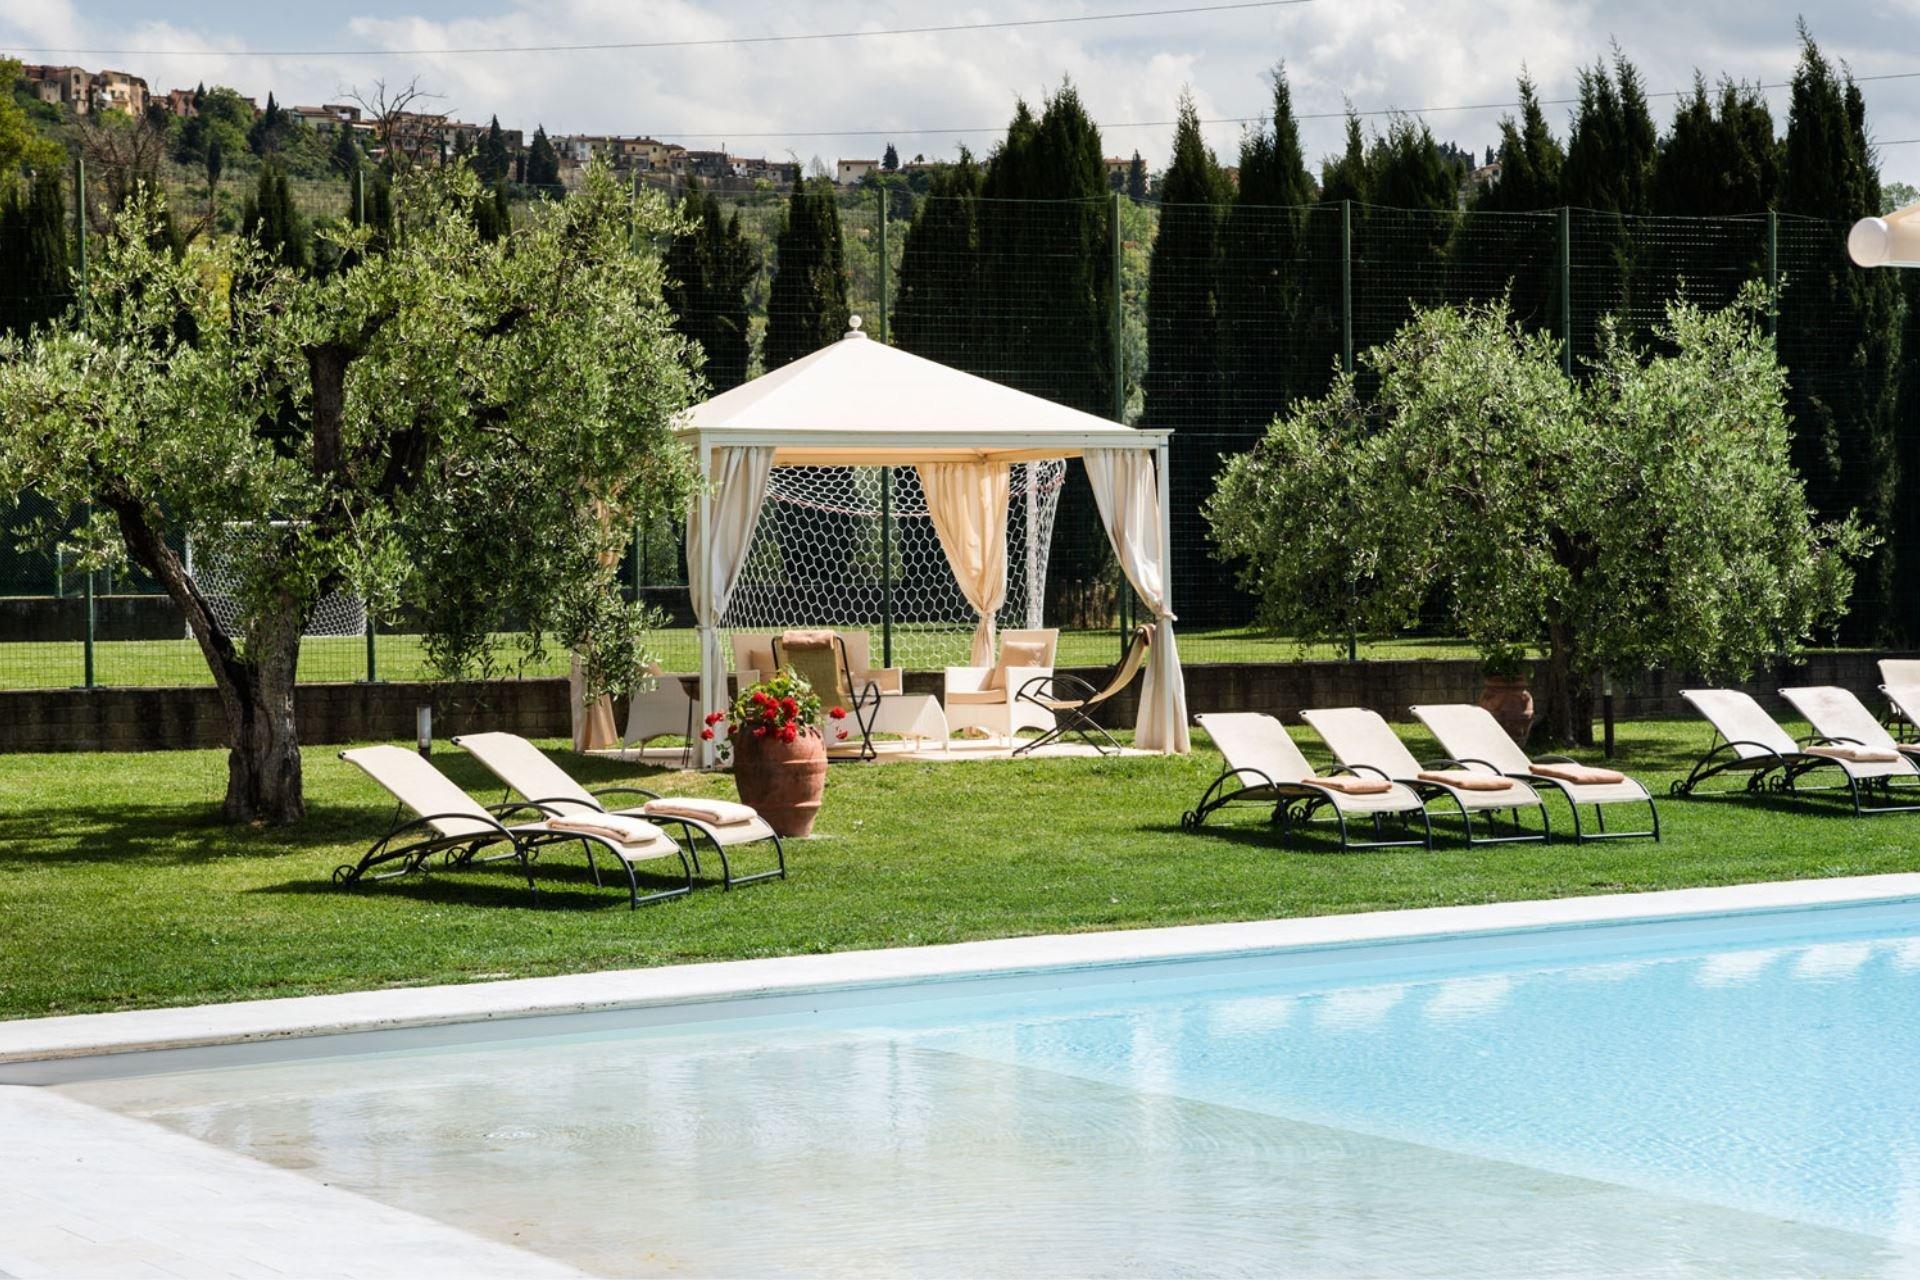 fattoria pogni - zwembad met prieel tuin